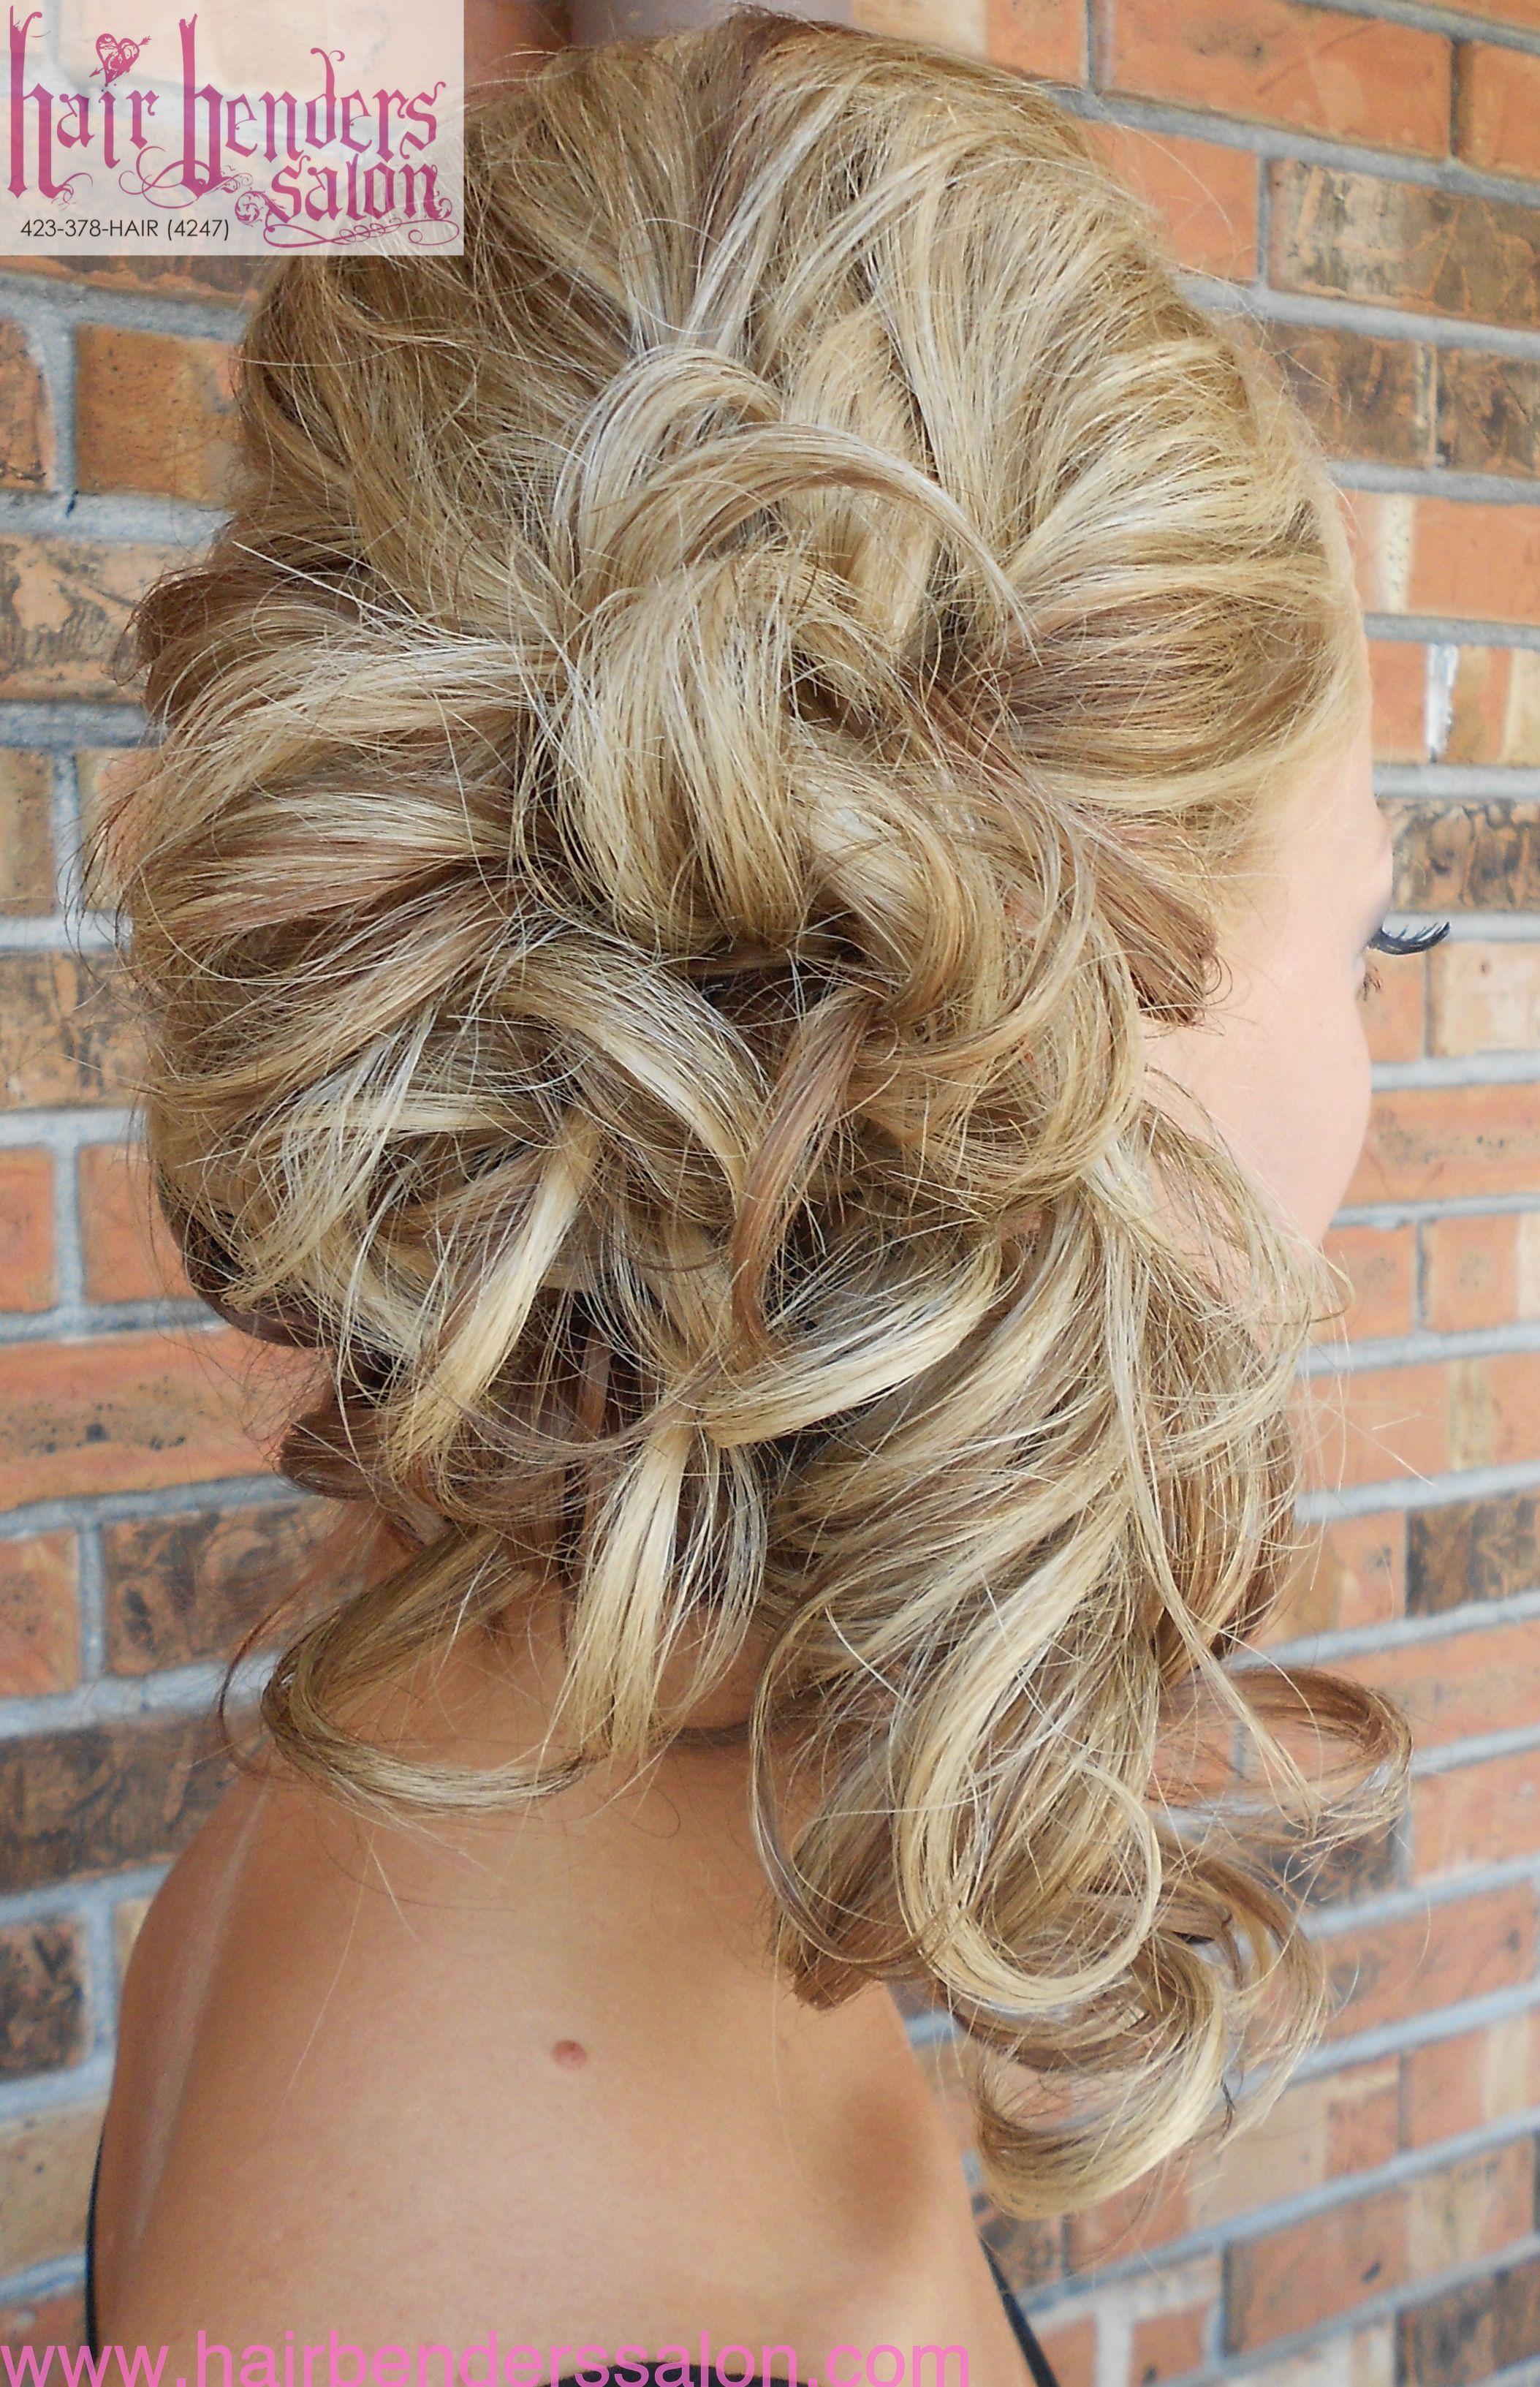 Curls pinned to side mindyus wedding crafting decor pinterest